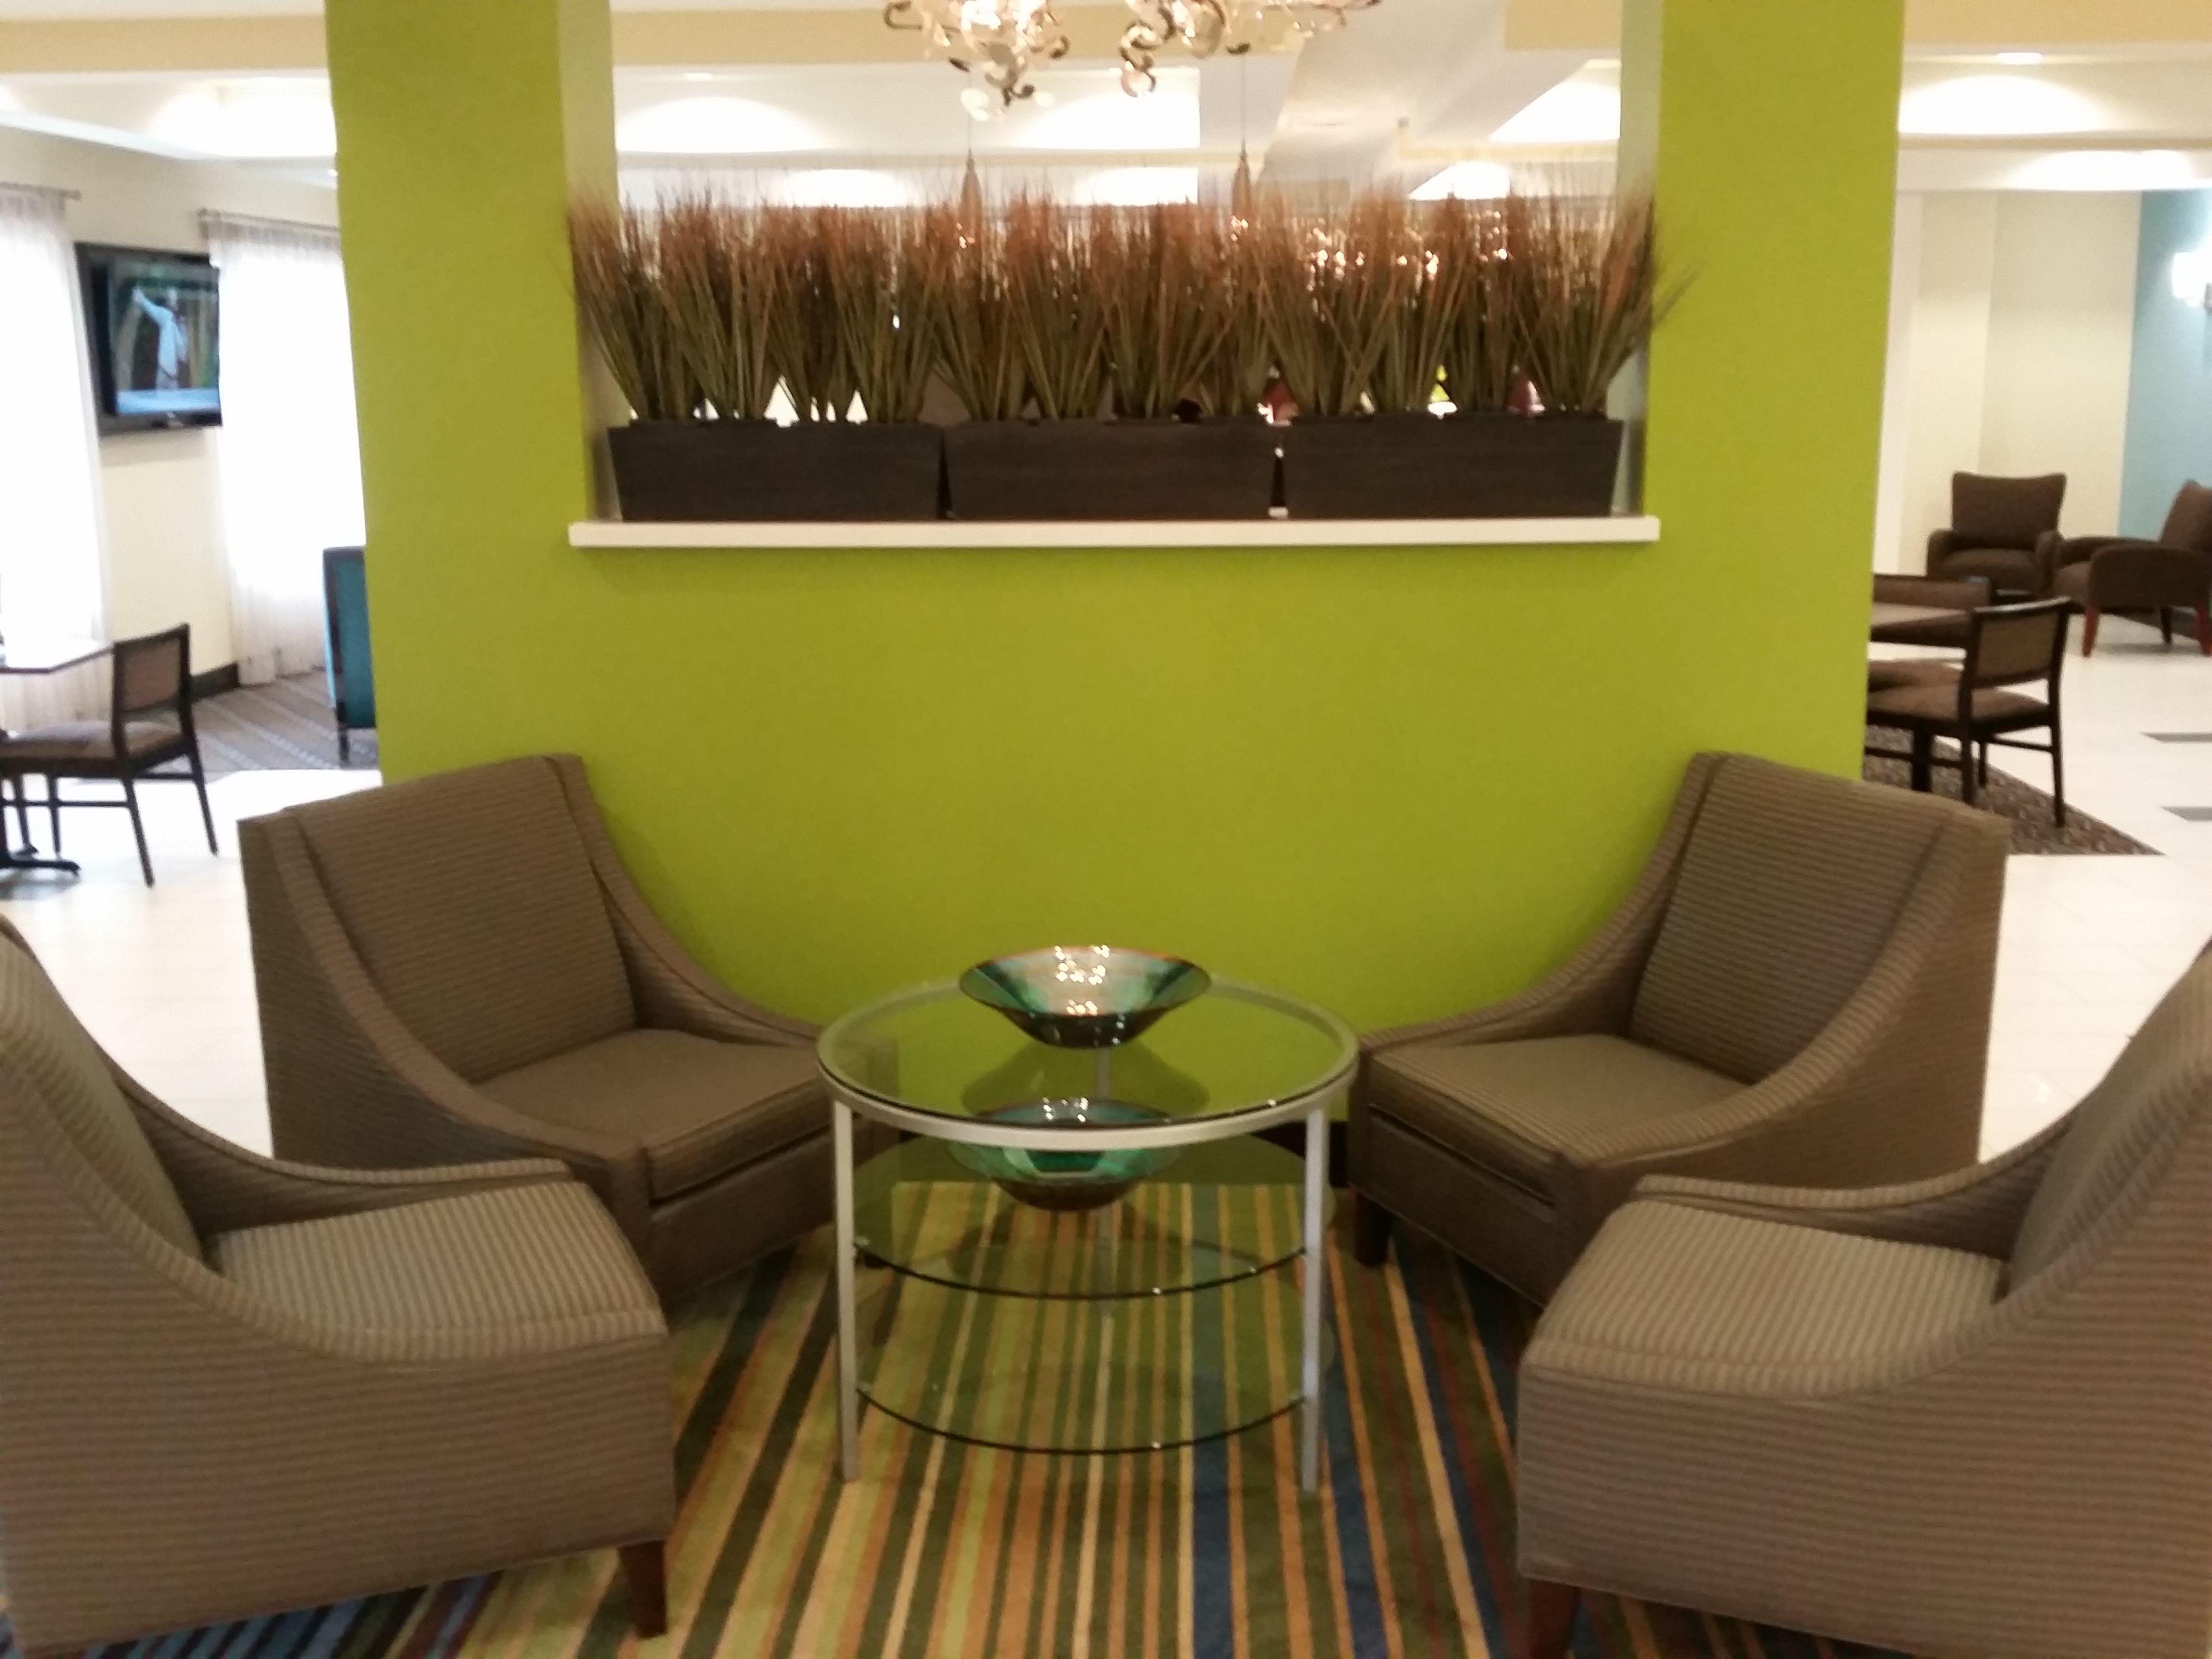 Holiday Inn Express & Suites Atascocita - Humble - Kingwood image 4